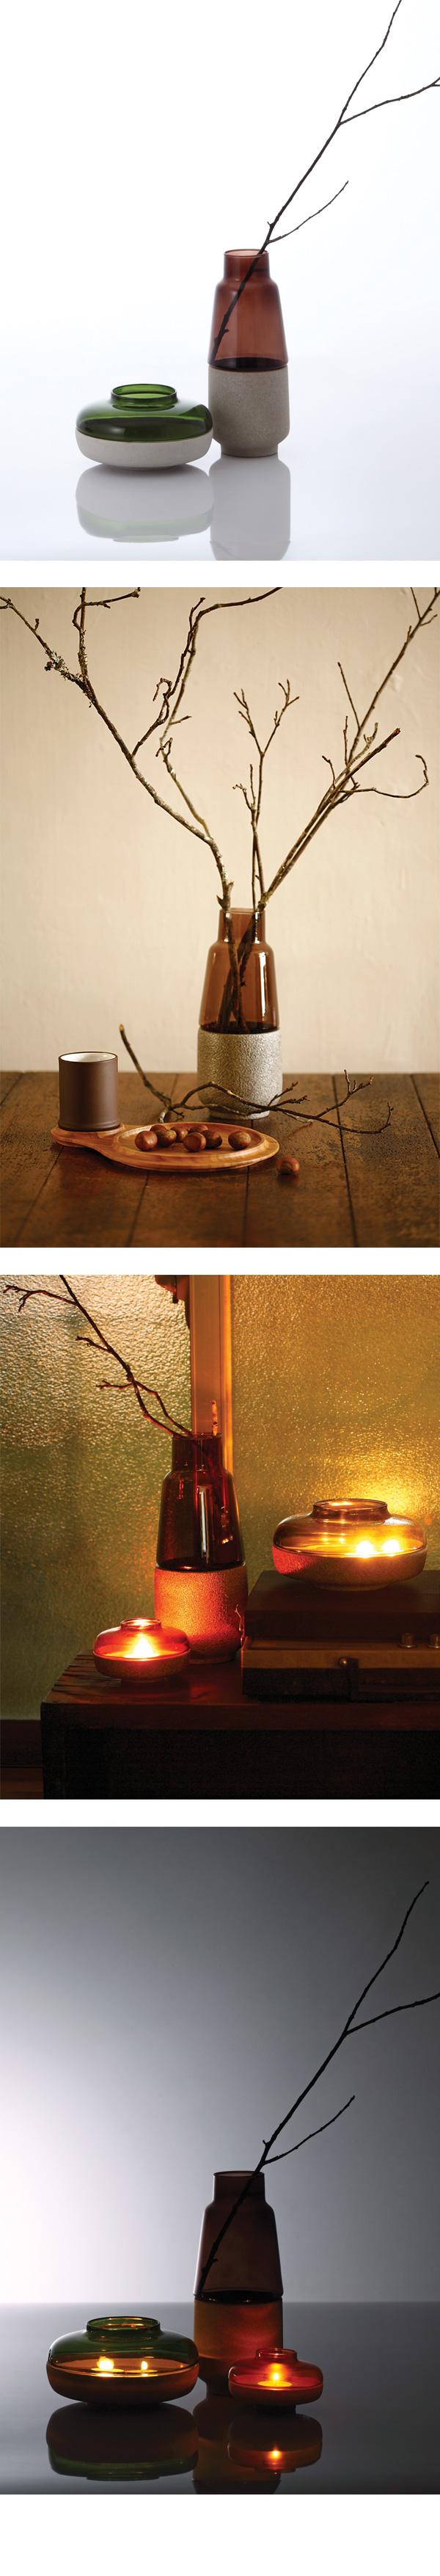 JIA Lantern & Shade 燈華系列 花器 大尺寸,Kate Chung 設計